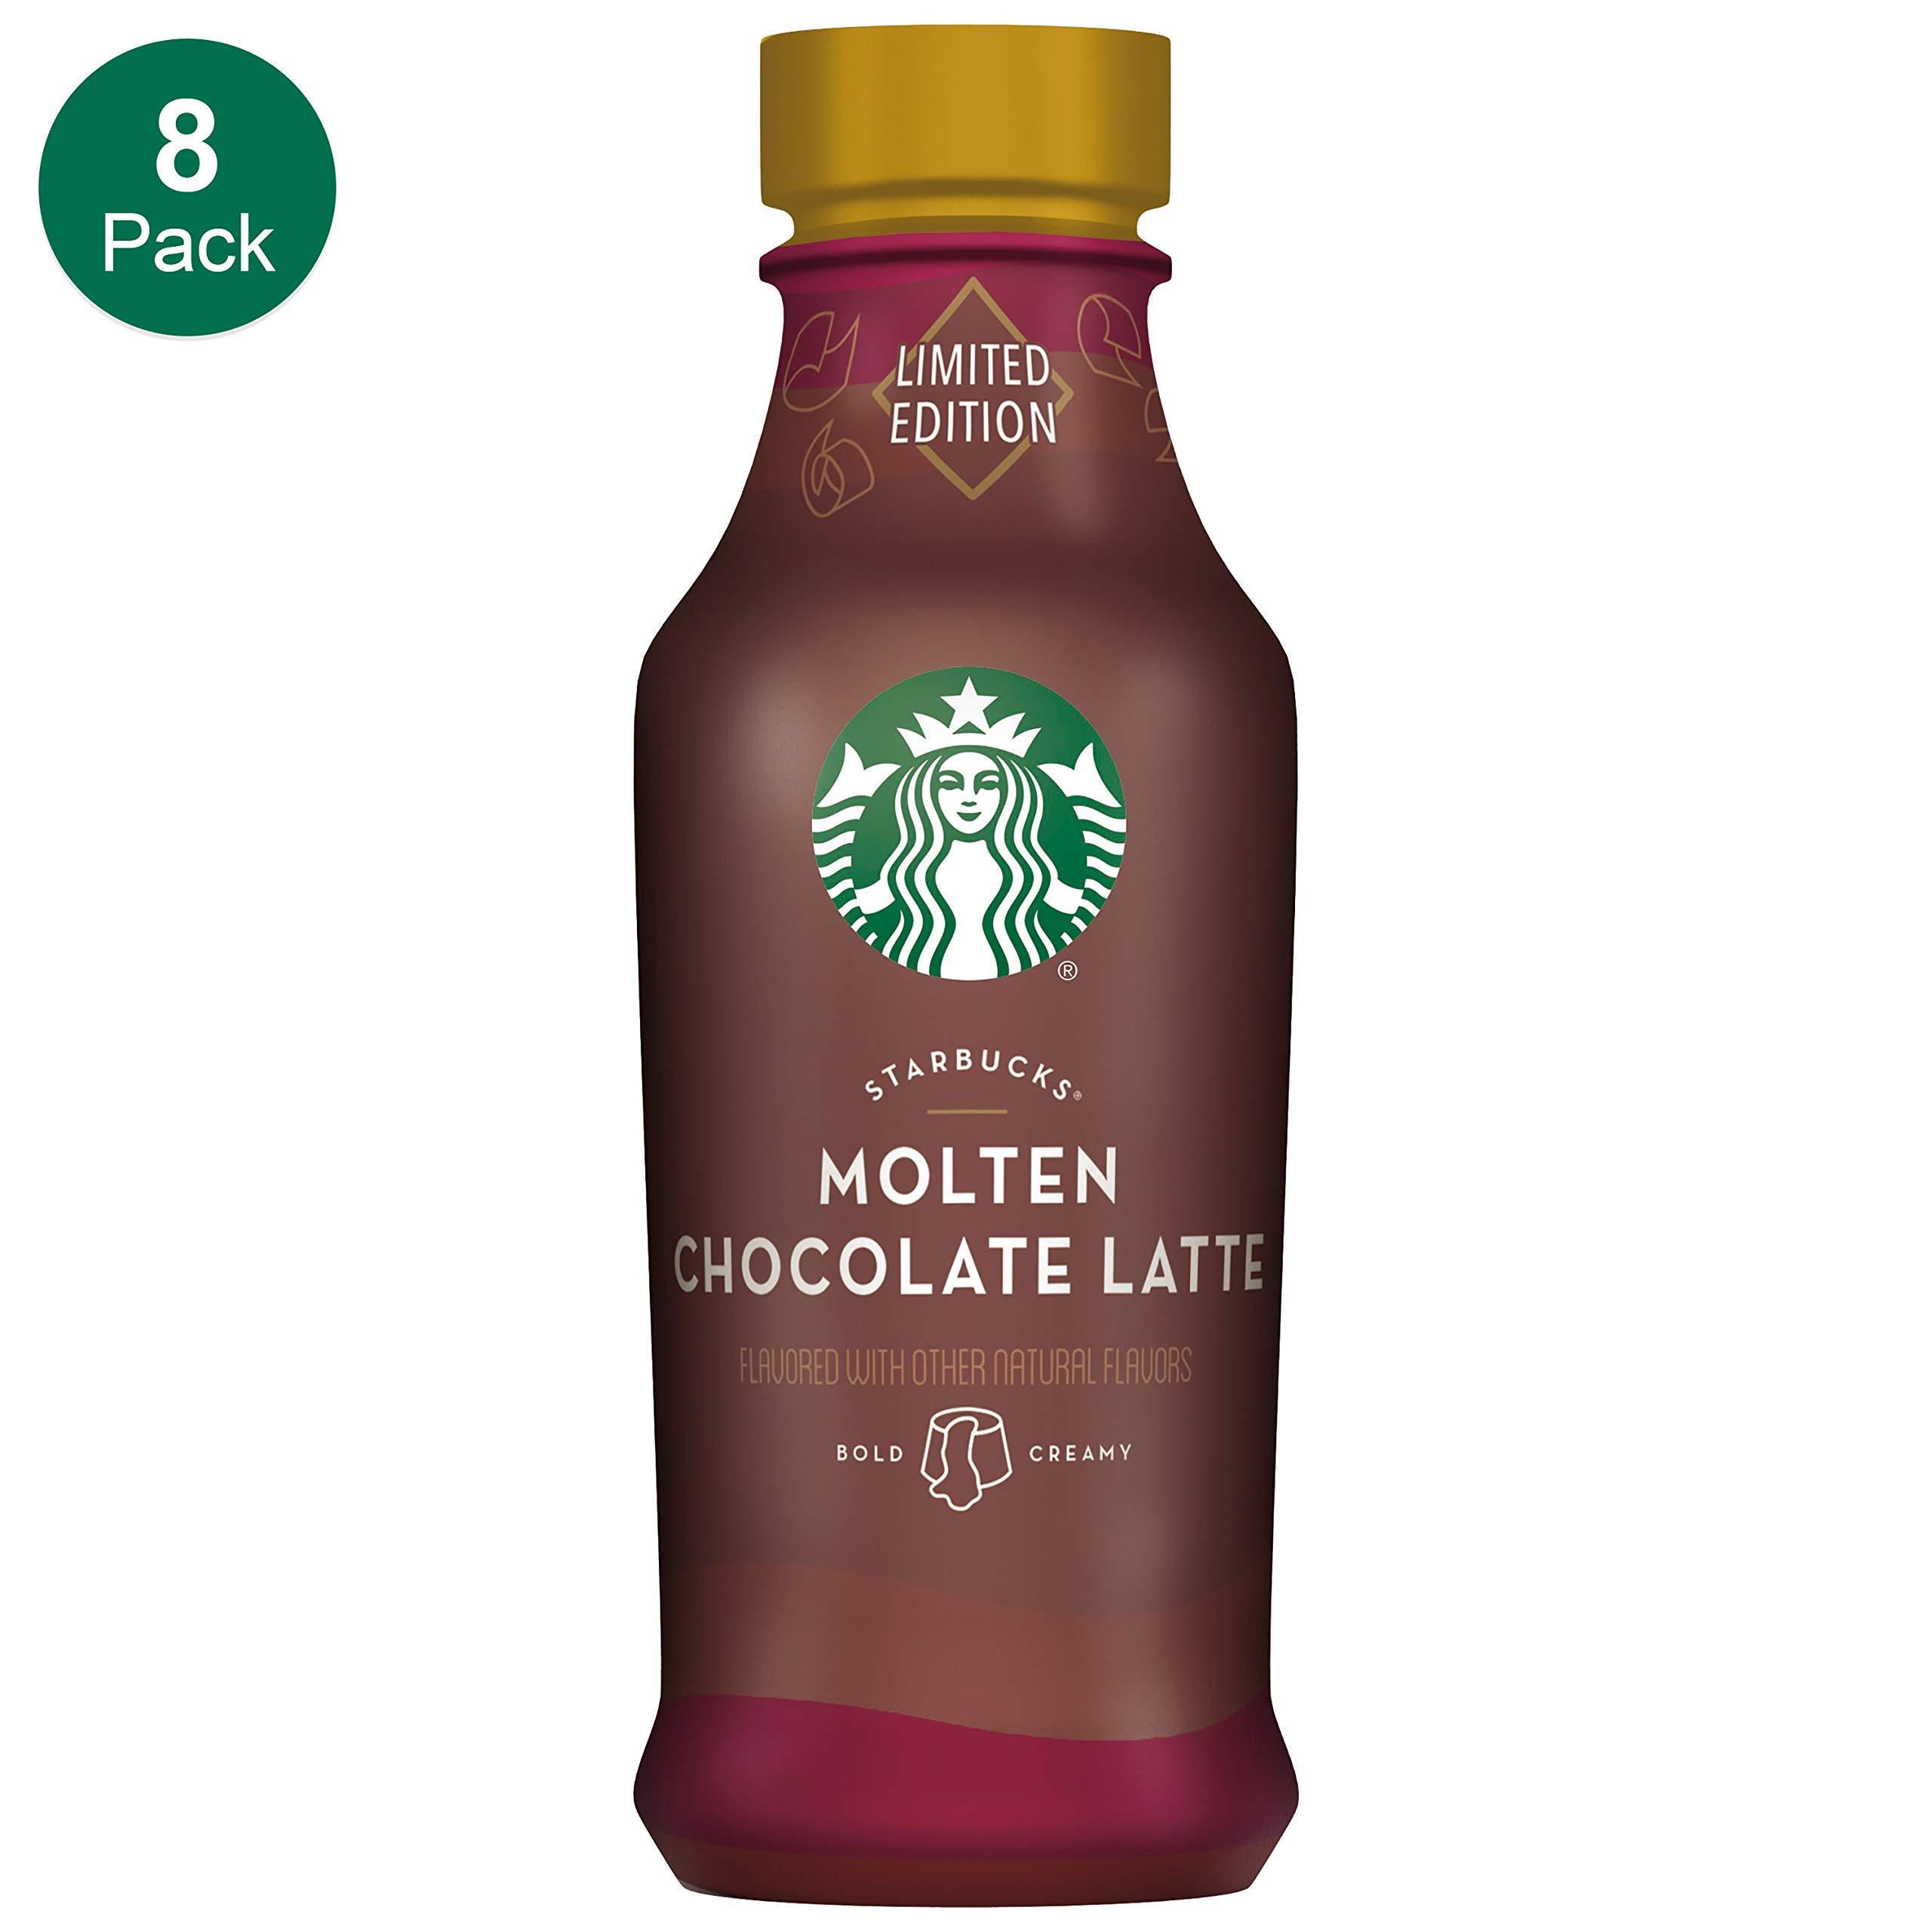 Starbucks, Iced Latte, Molten Chocolate, 14 Fl Oz (Pack of 8) by Starbucks